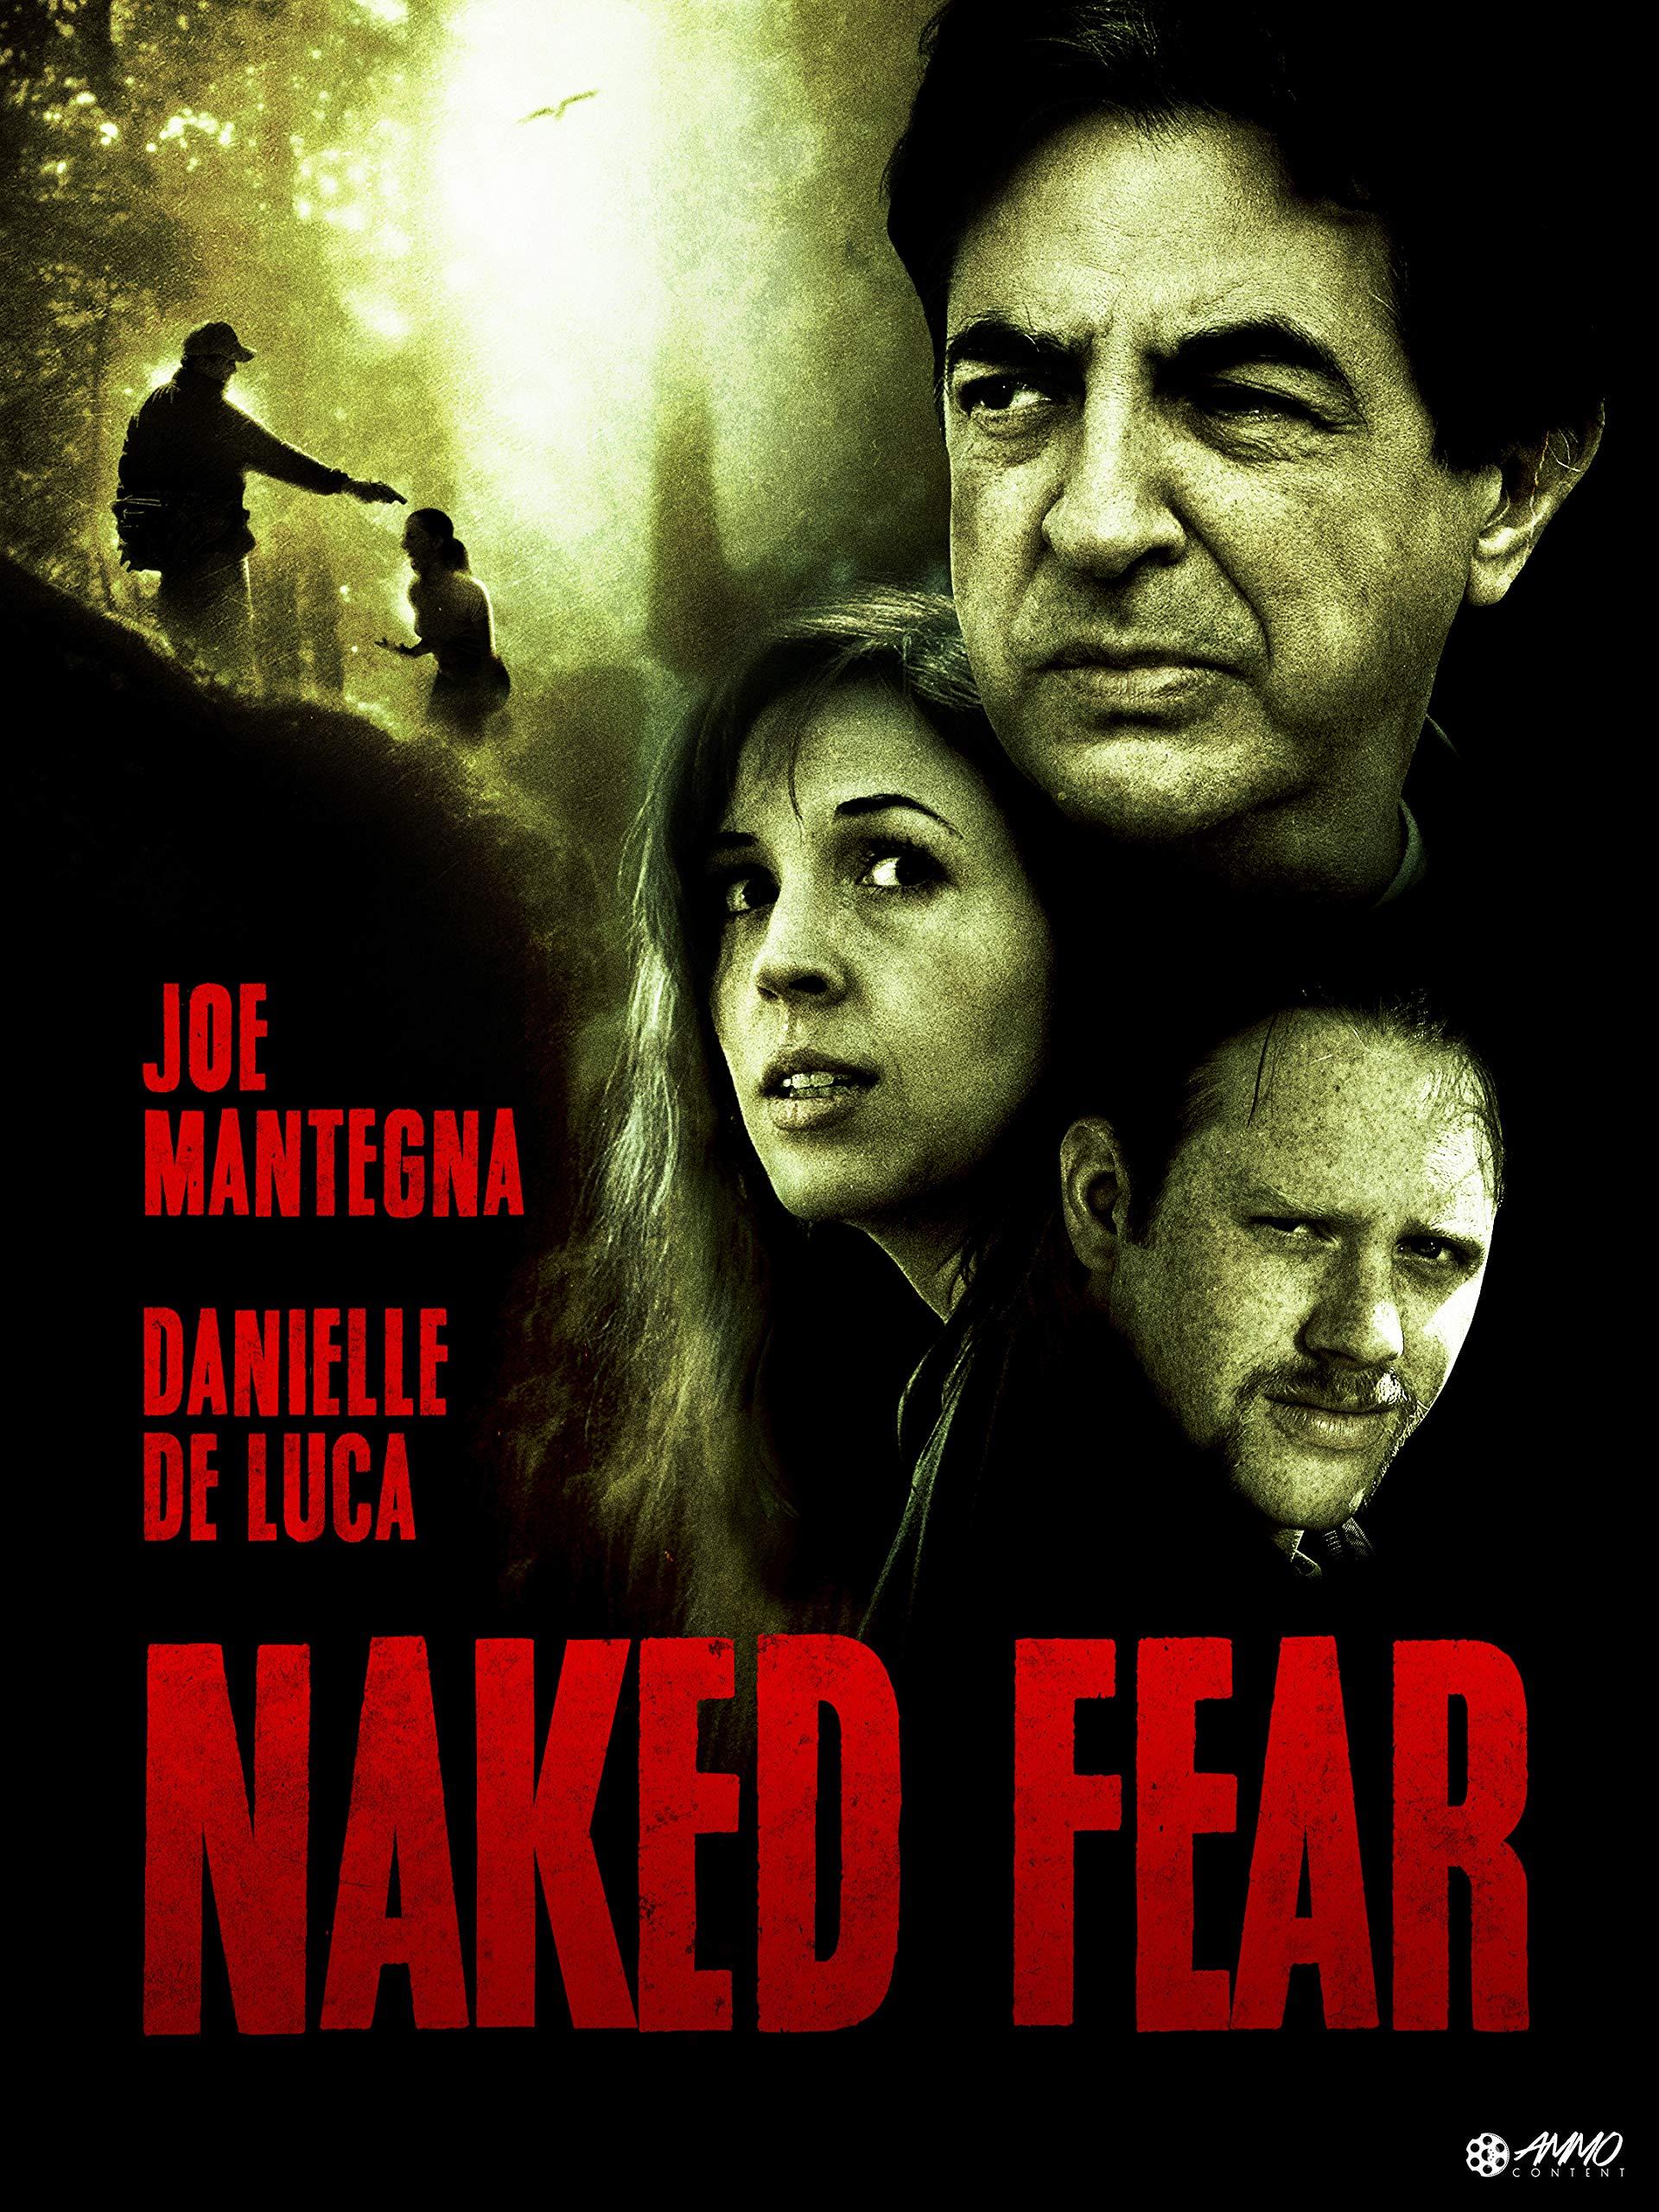 Naked Fear (2007) - Trakt.tv